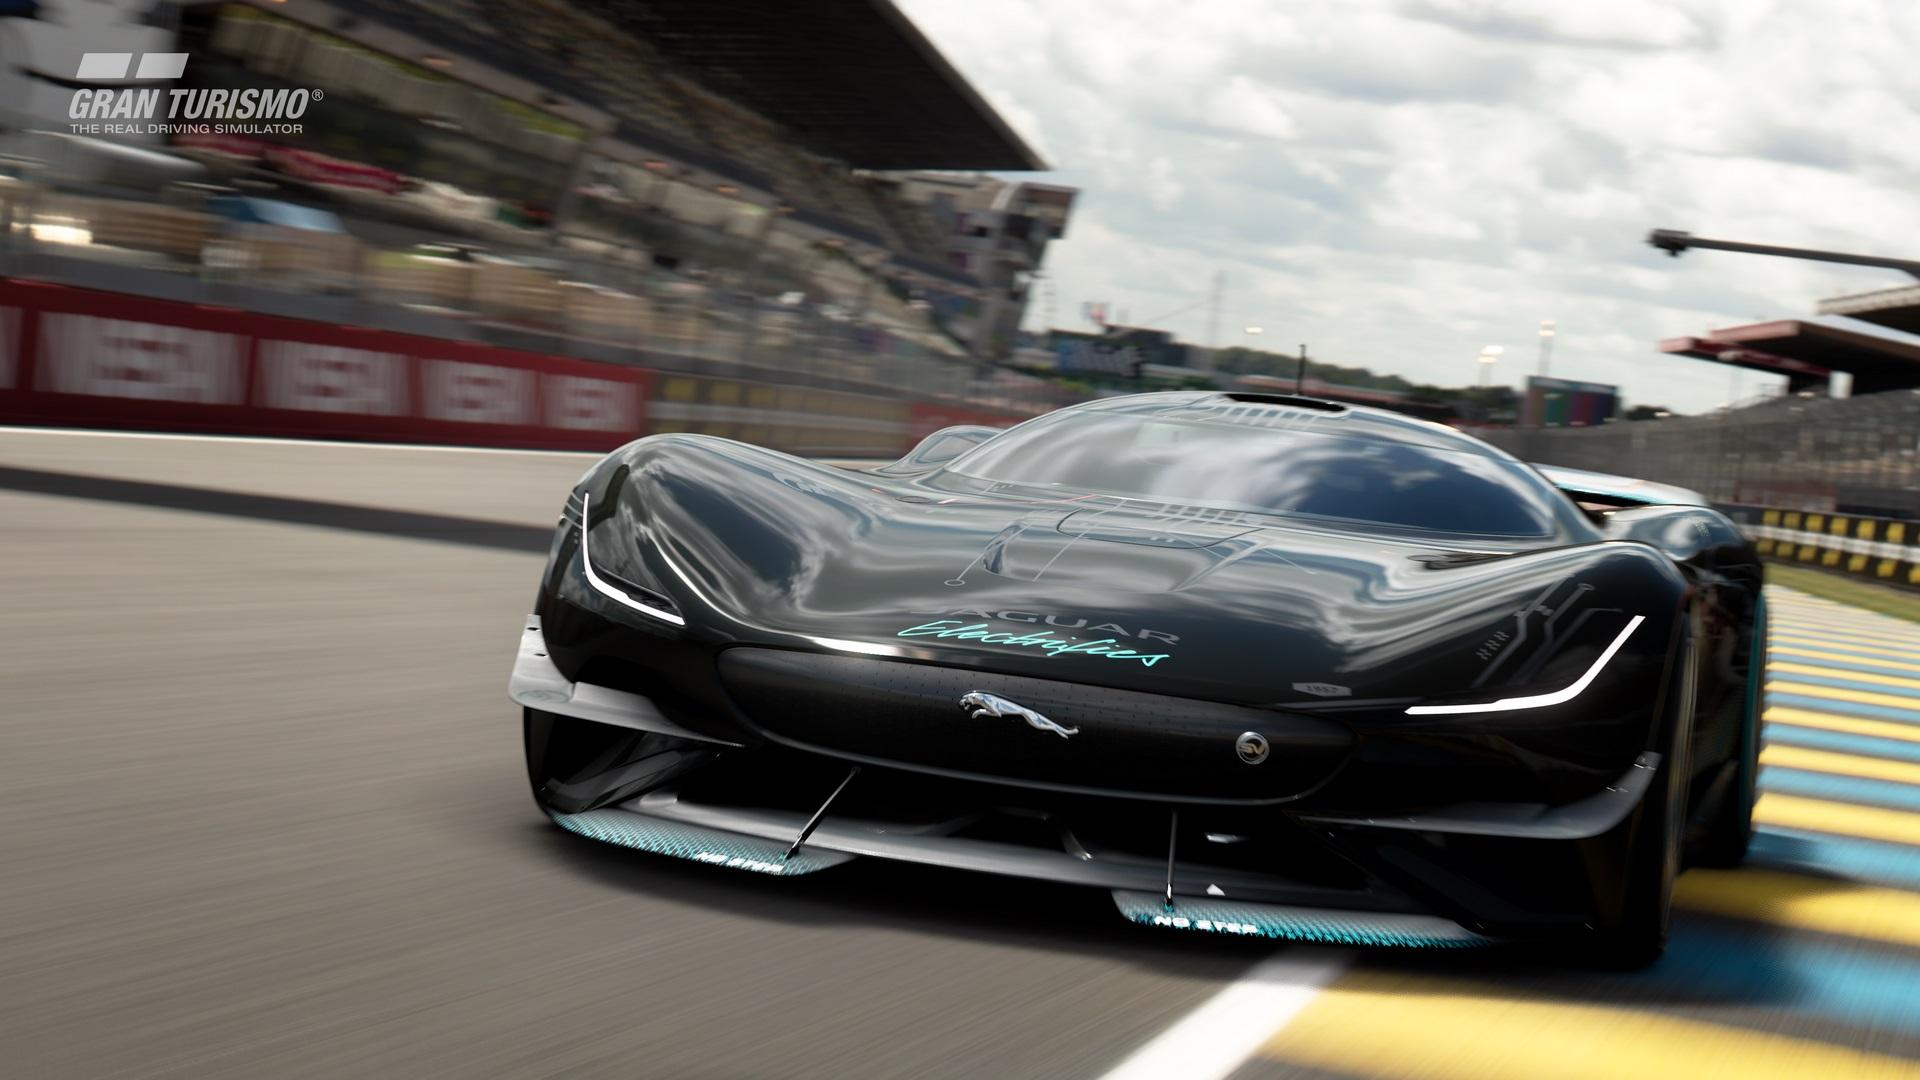 Jaguar-Vision-Gran-Turismo-SV-8